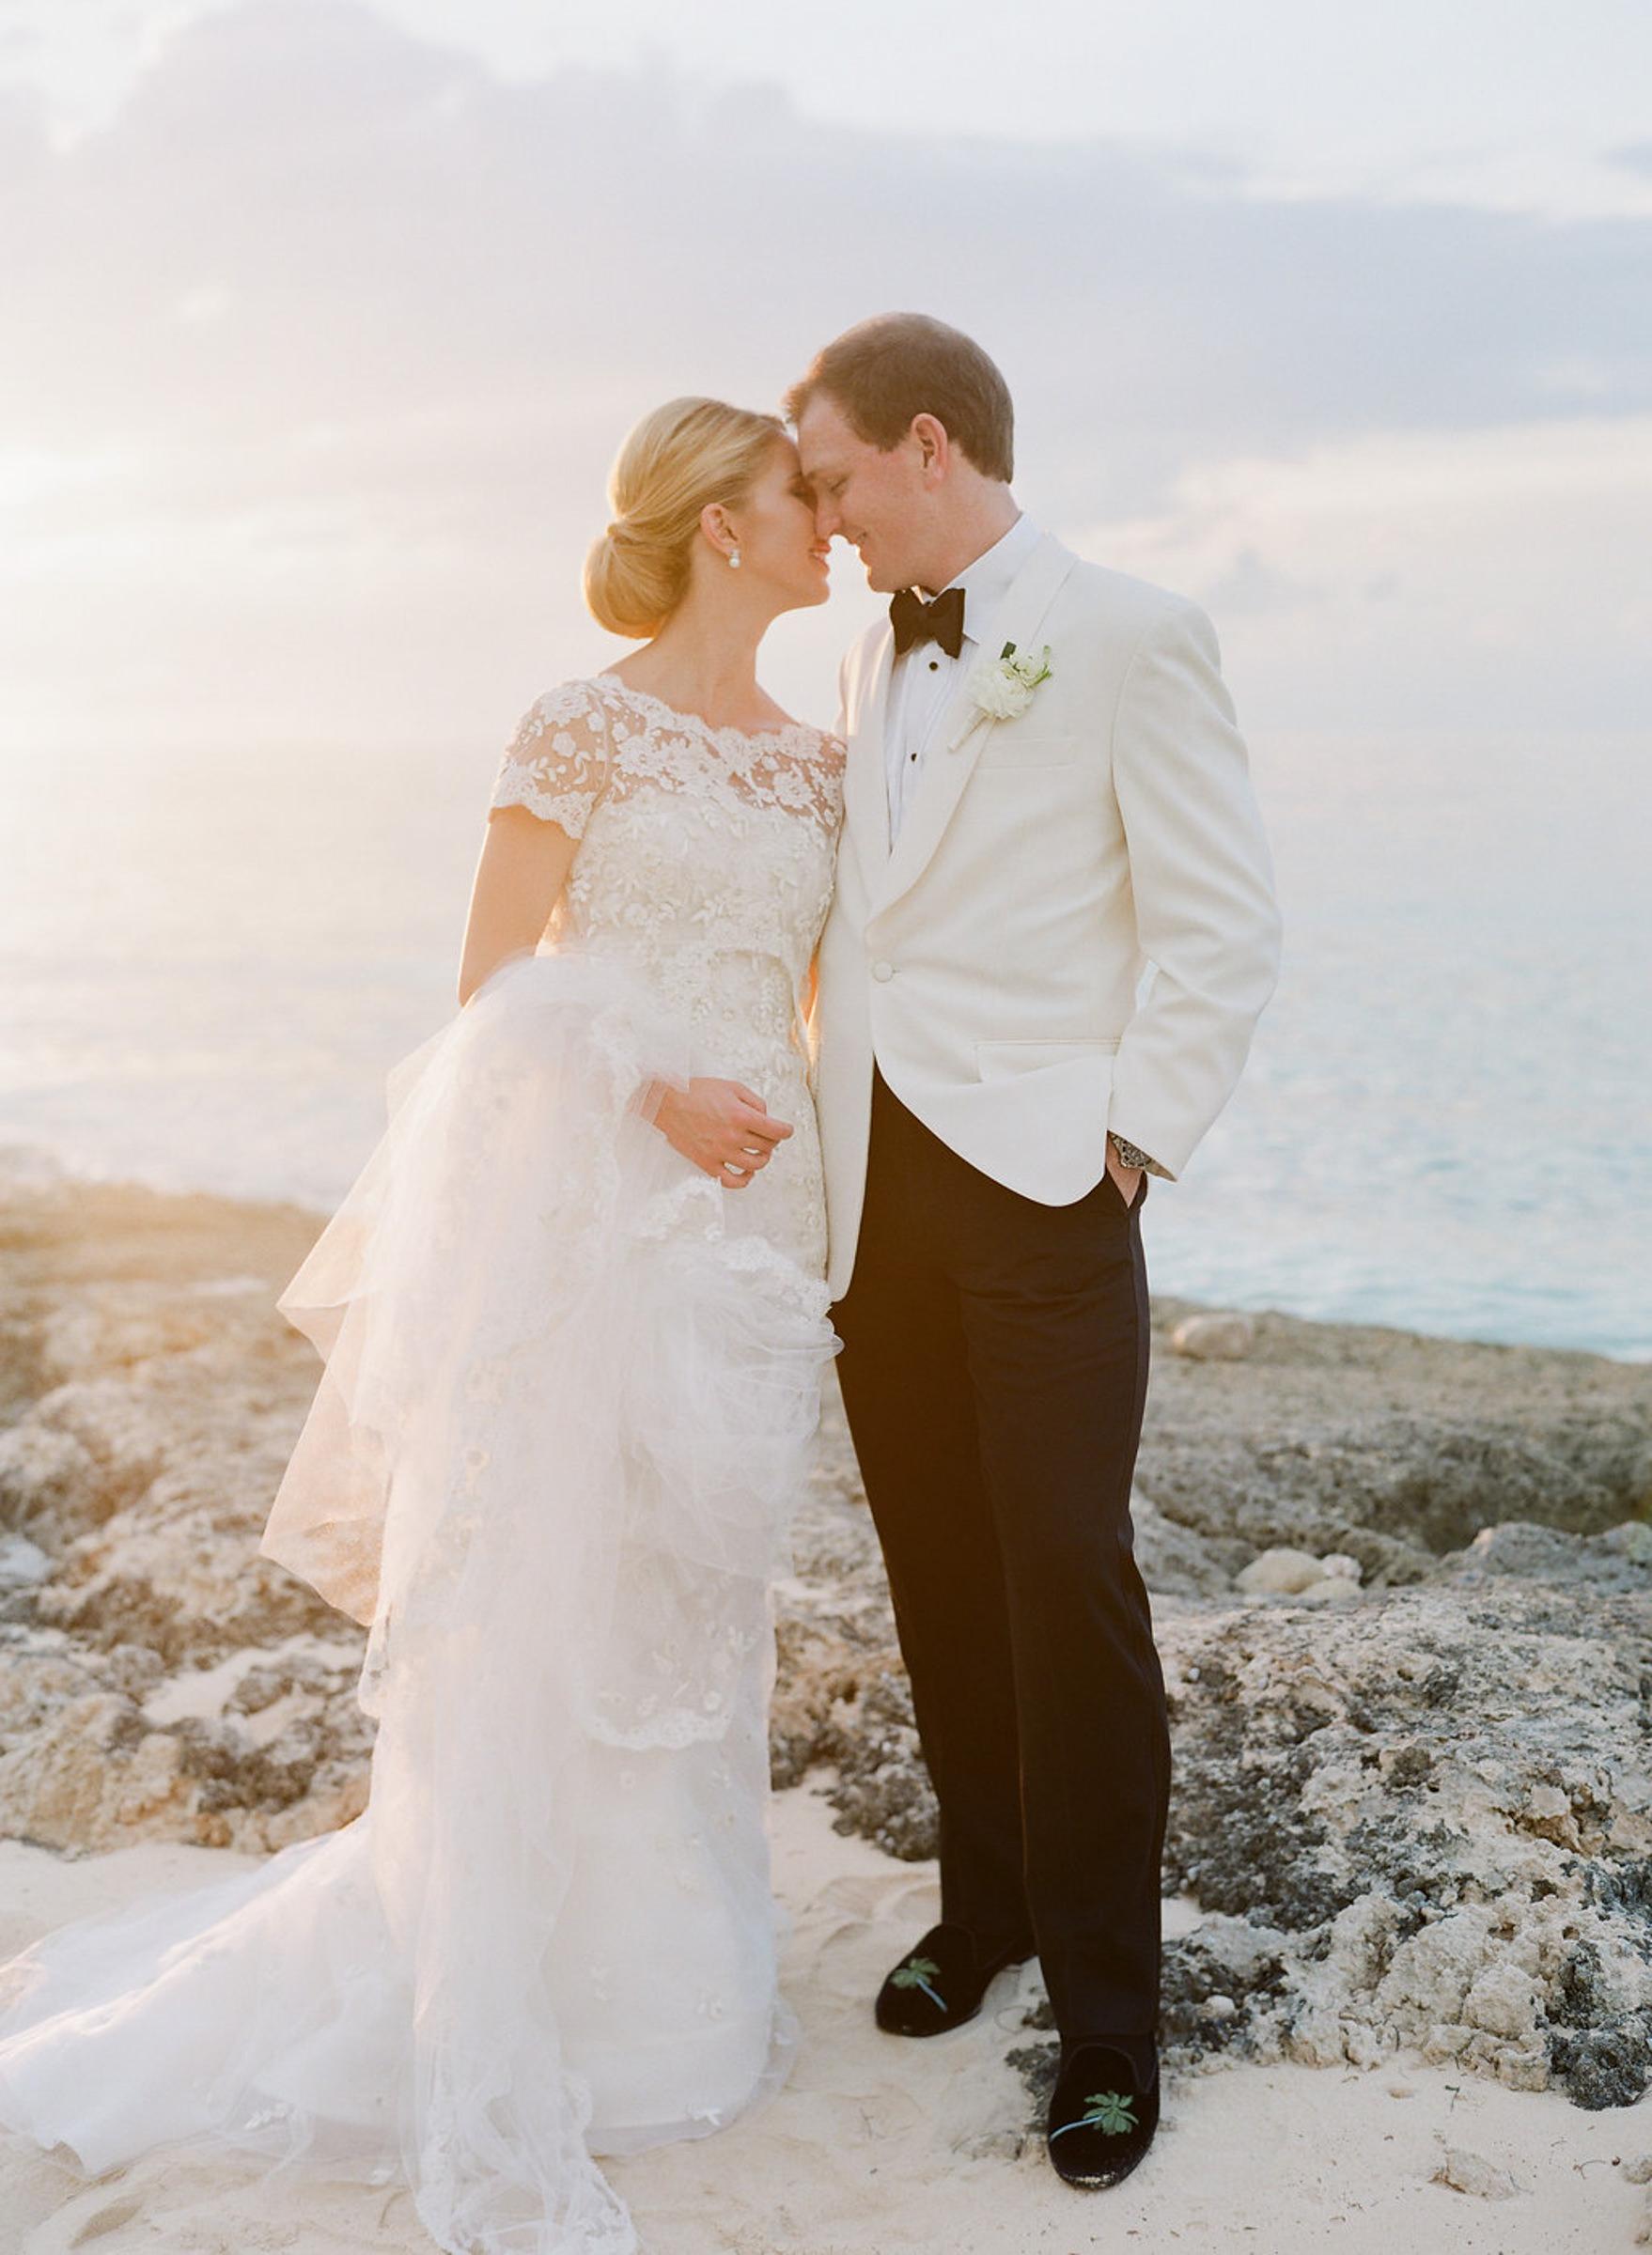 Romamtic portrait of bride and groom wearing white tuxedo by Corbin Gurkin